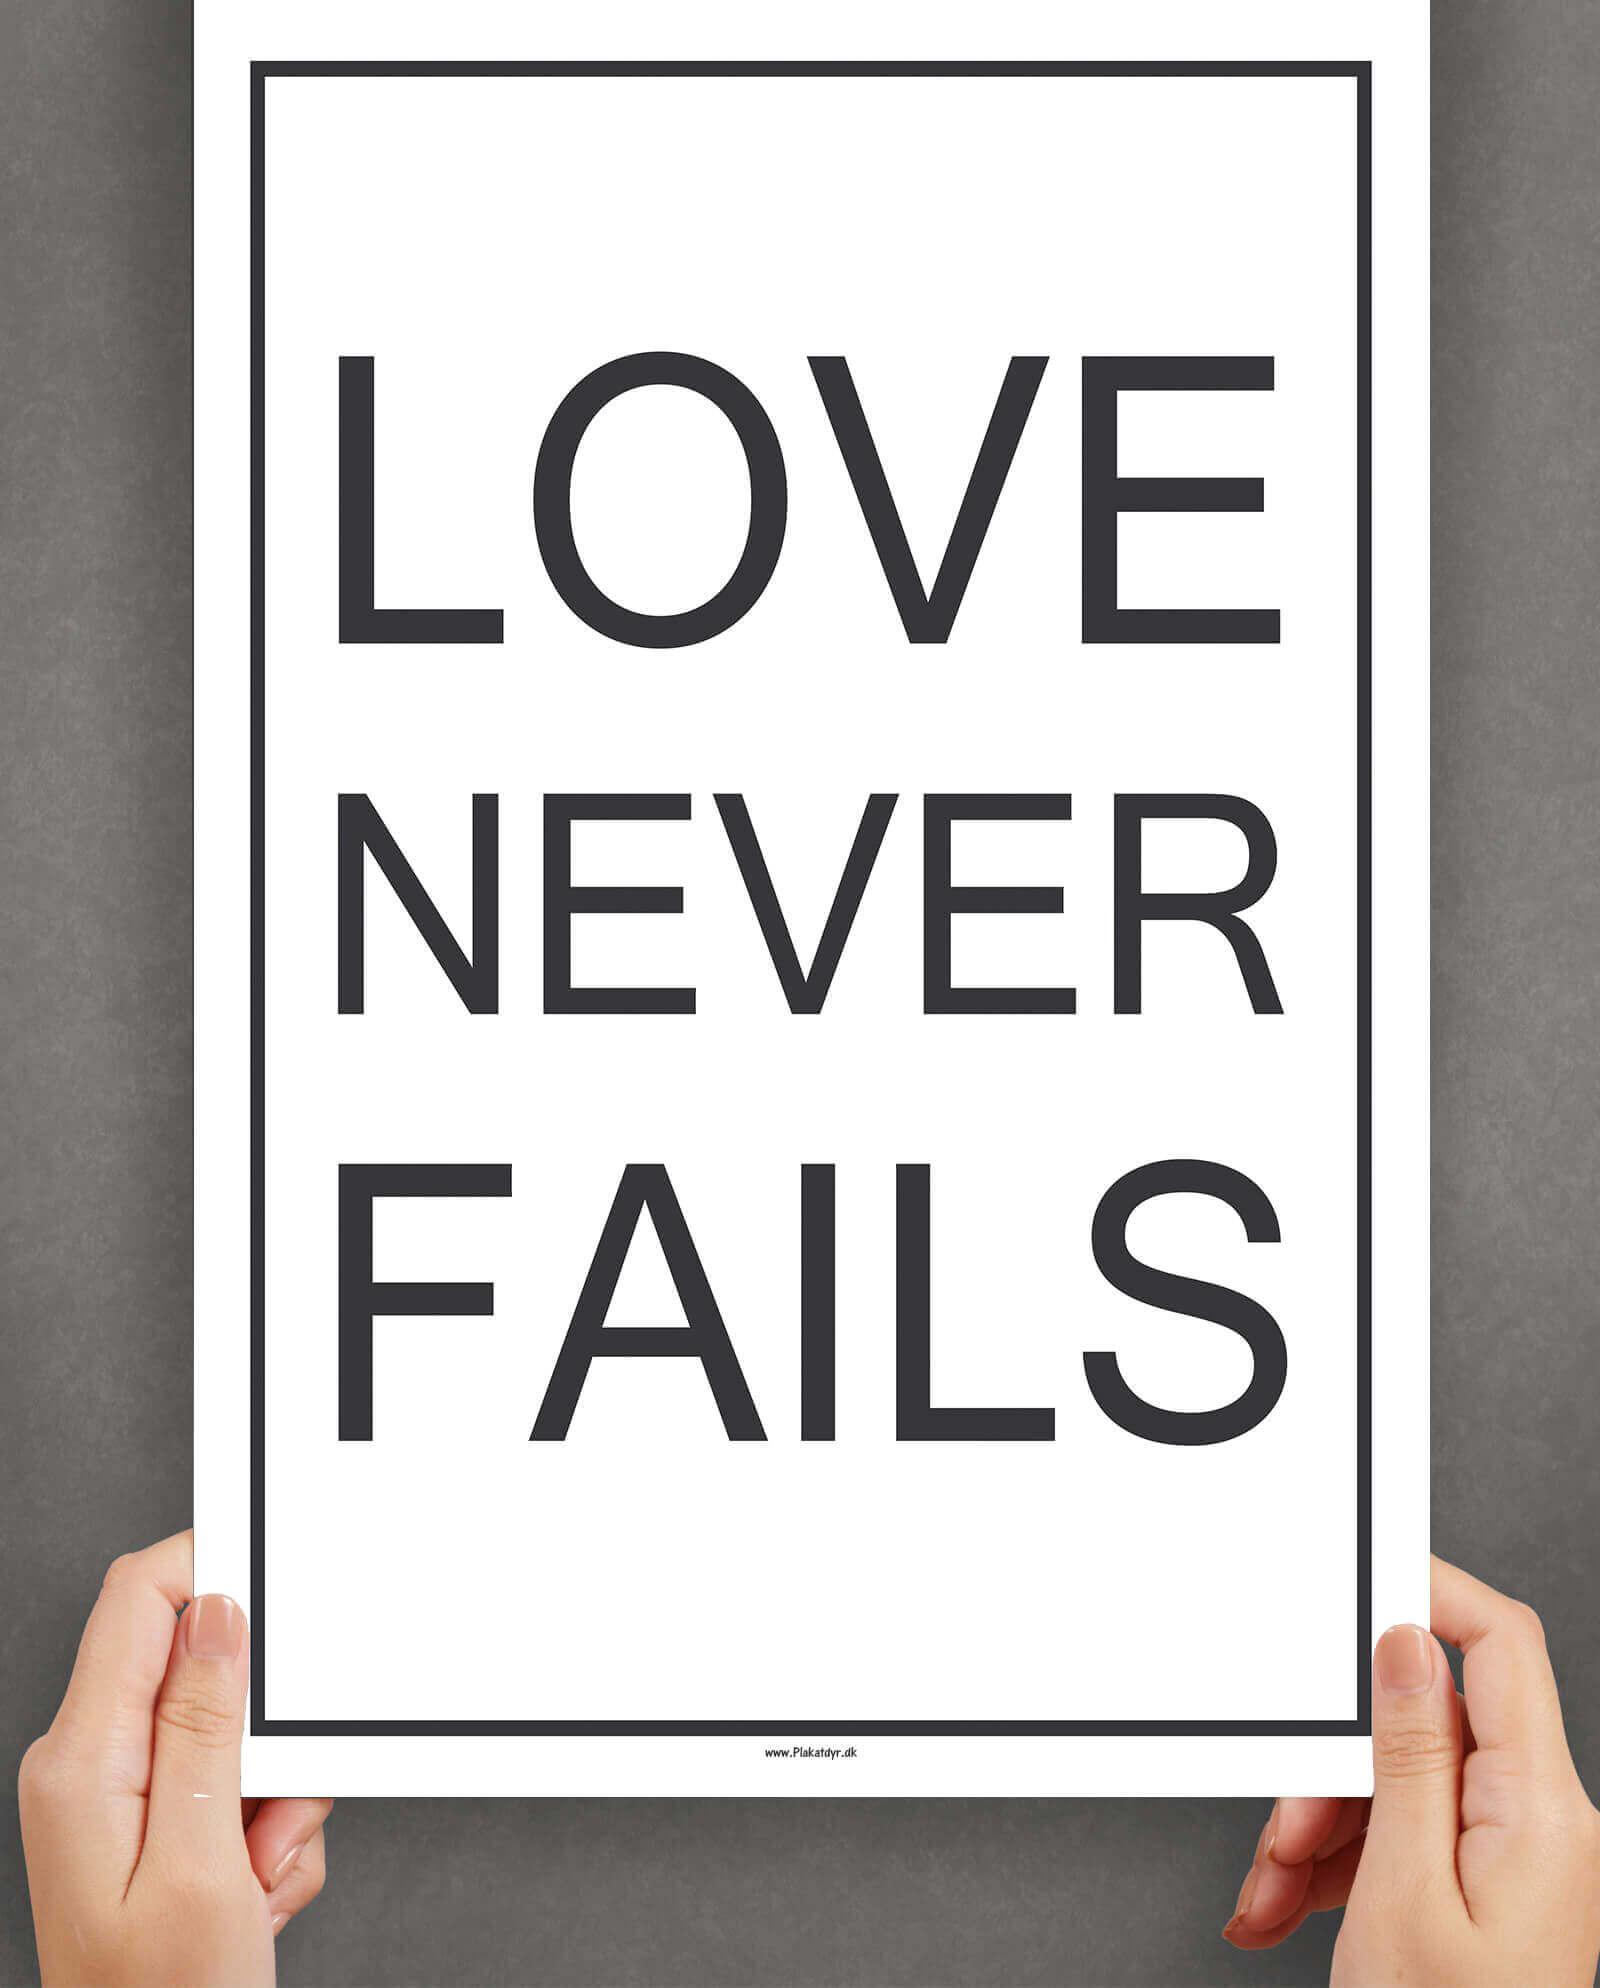 Love-never-fails-hvid-boligplakat